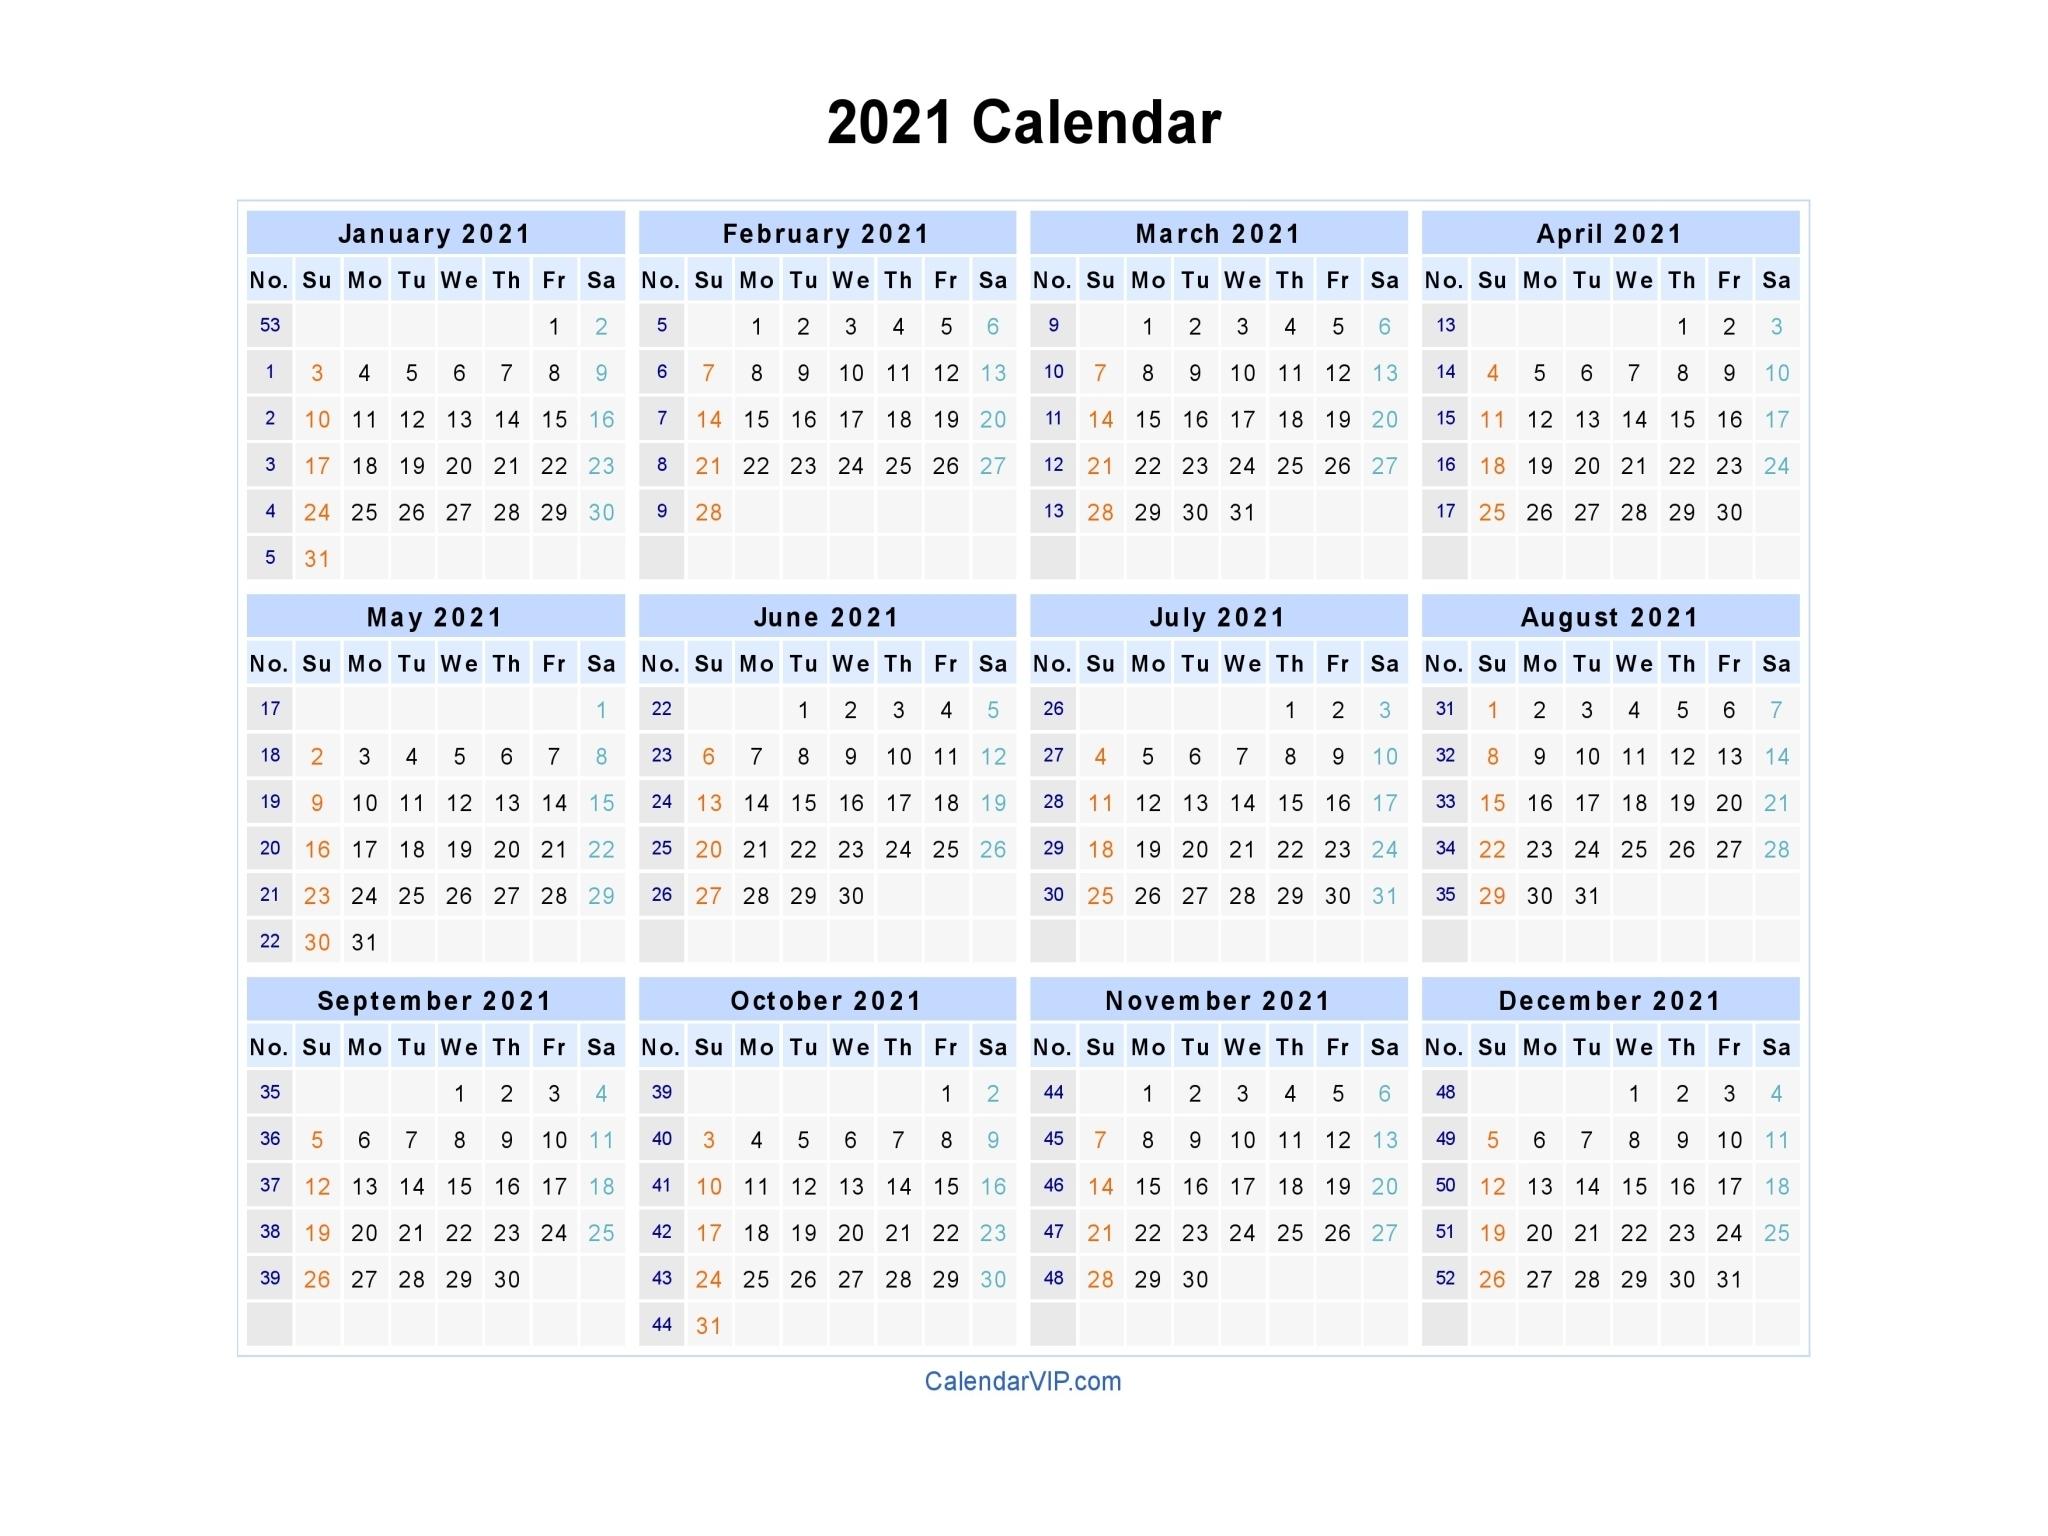 2021 Calendar - Blank Printable Calendar Template In Pdf